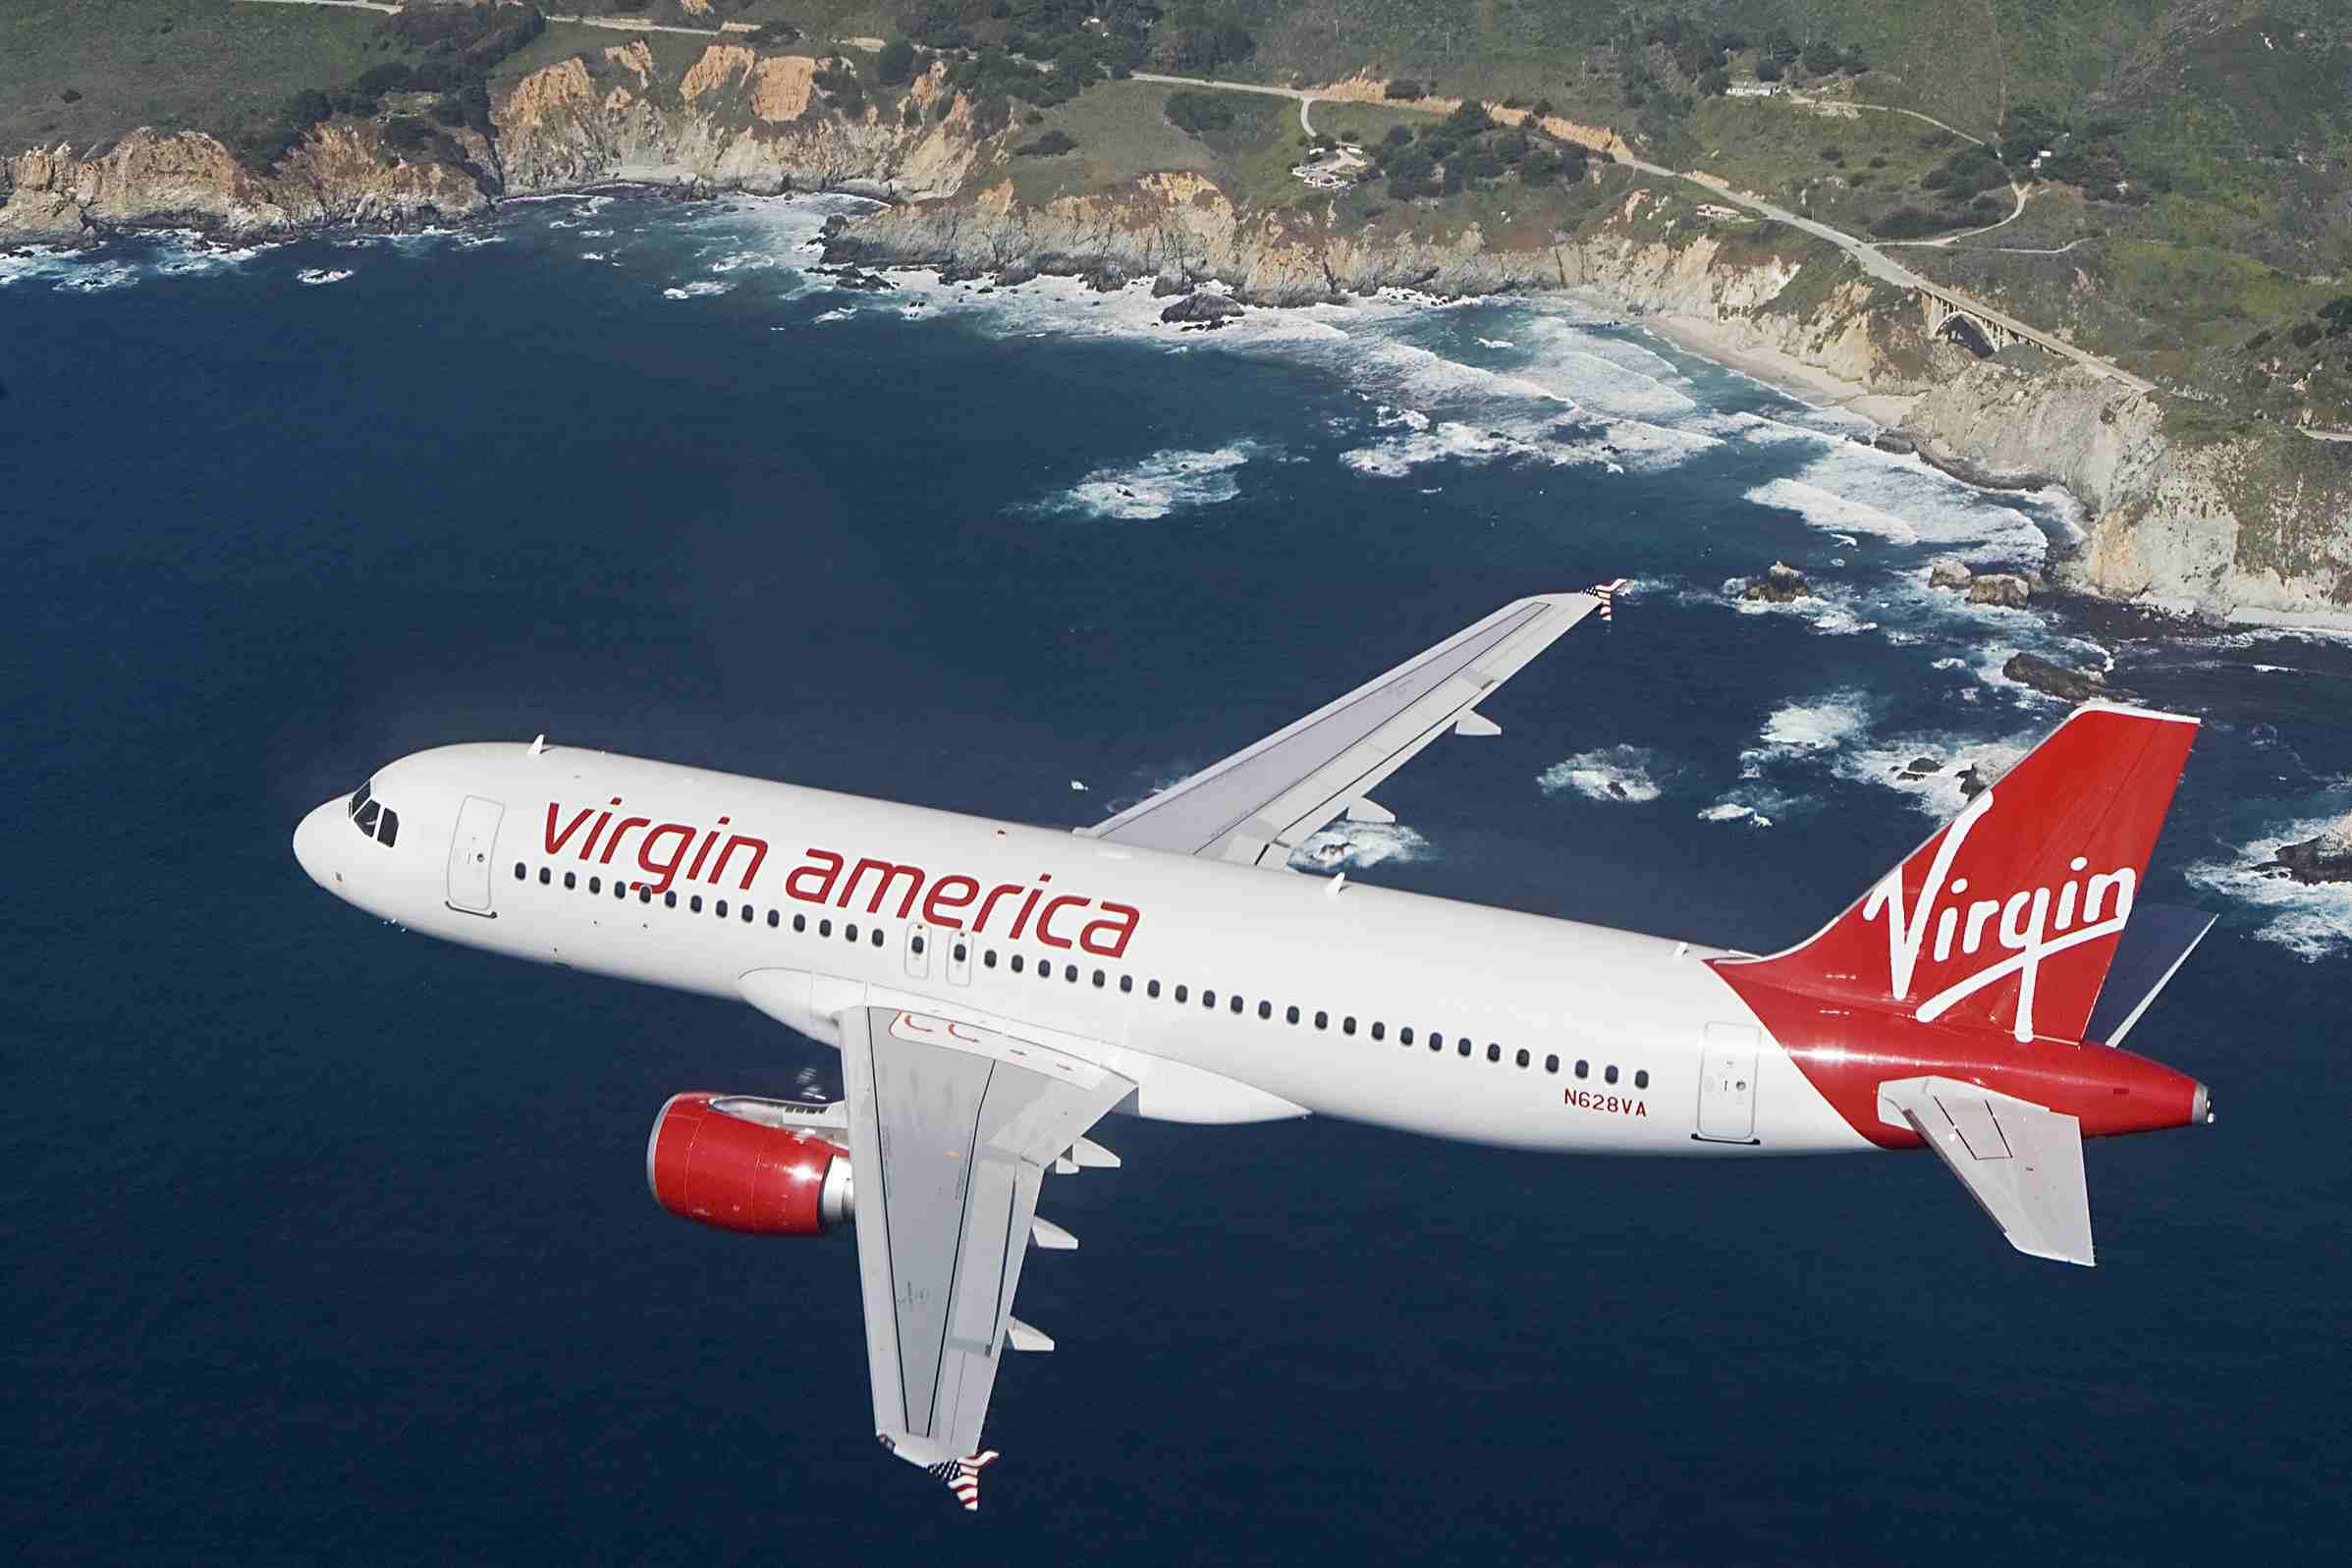 Virgin America flying over a coastine